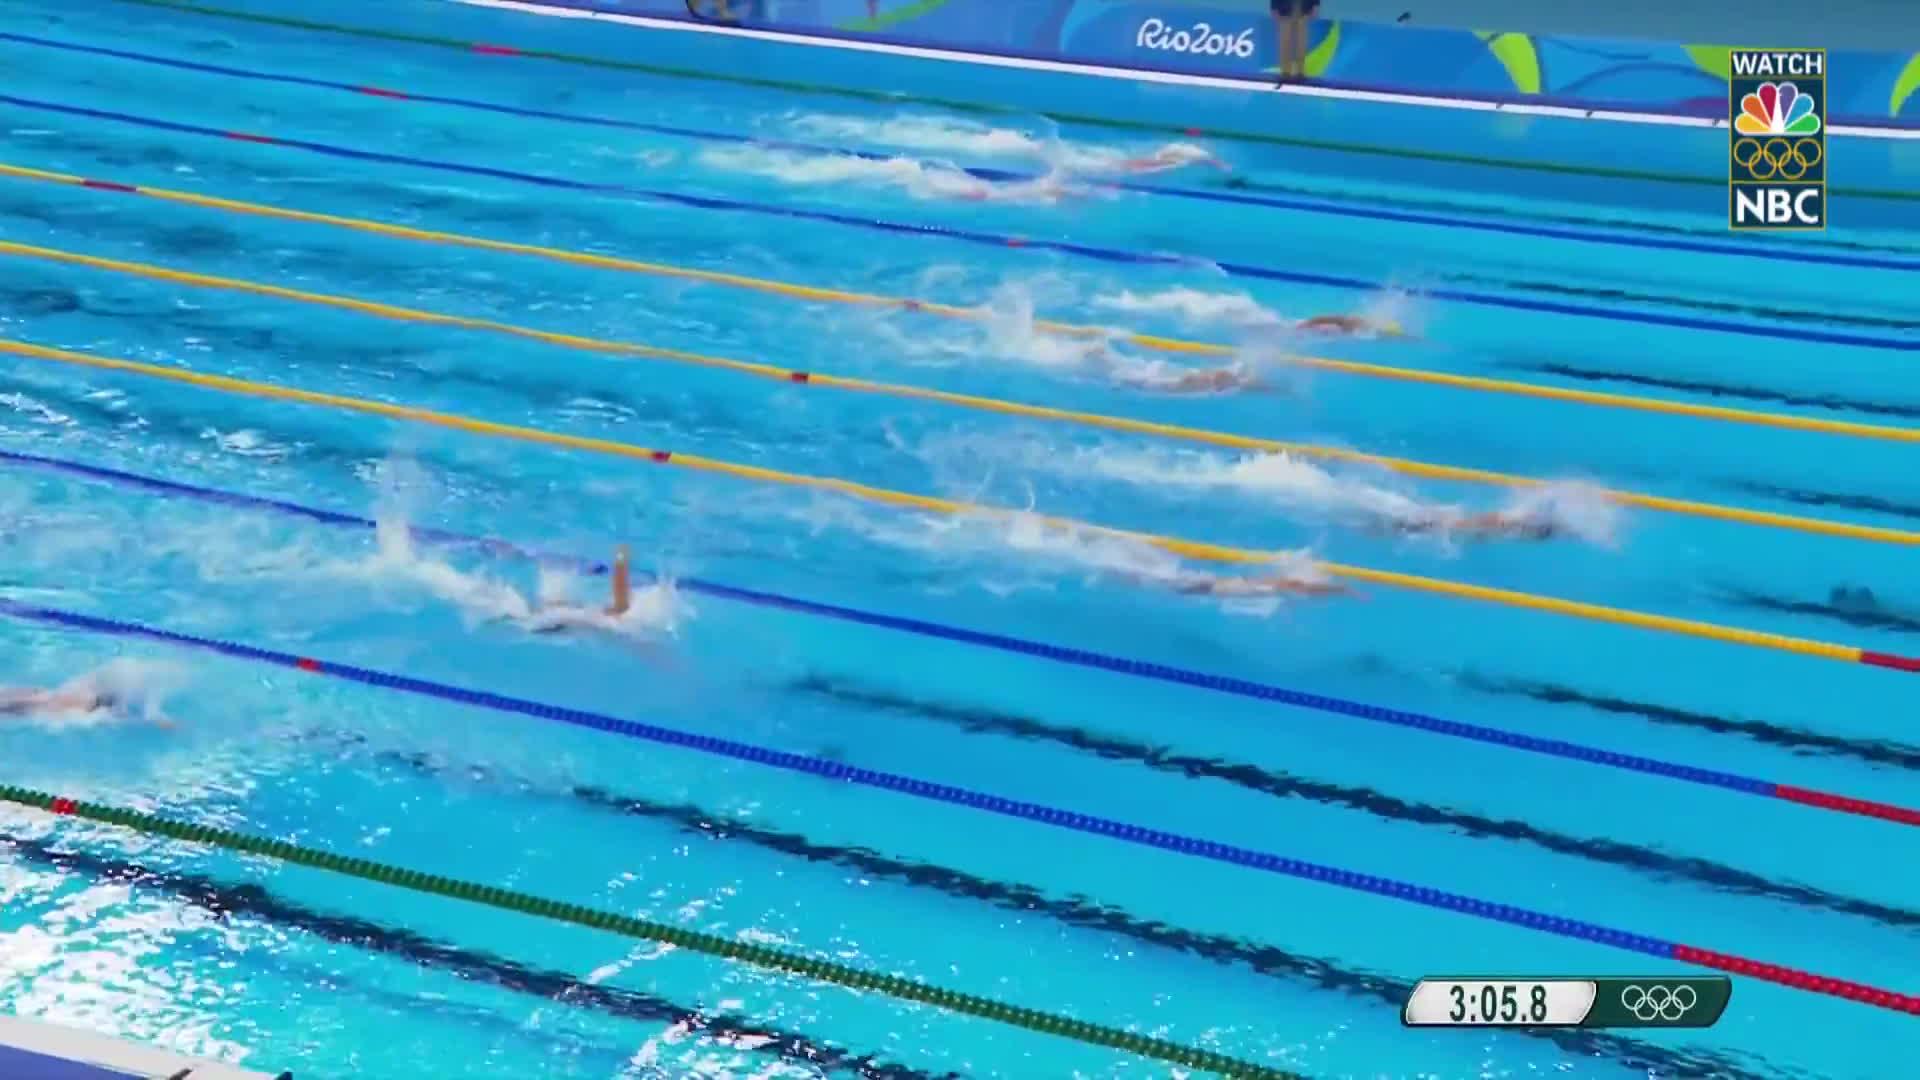 nbc sports, olymgifs, olympics, U.S. wins 4x100 freestyle relay gold behind Phelps, Adrian GIFs